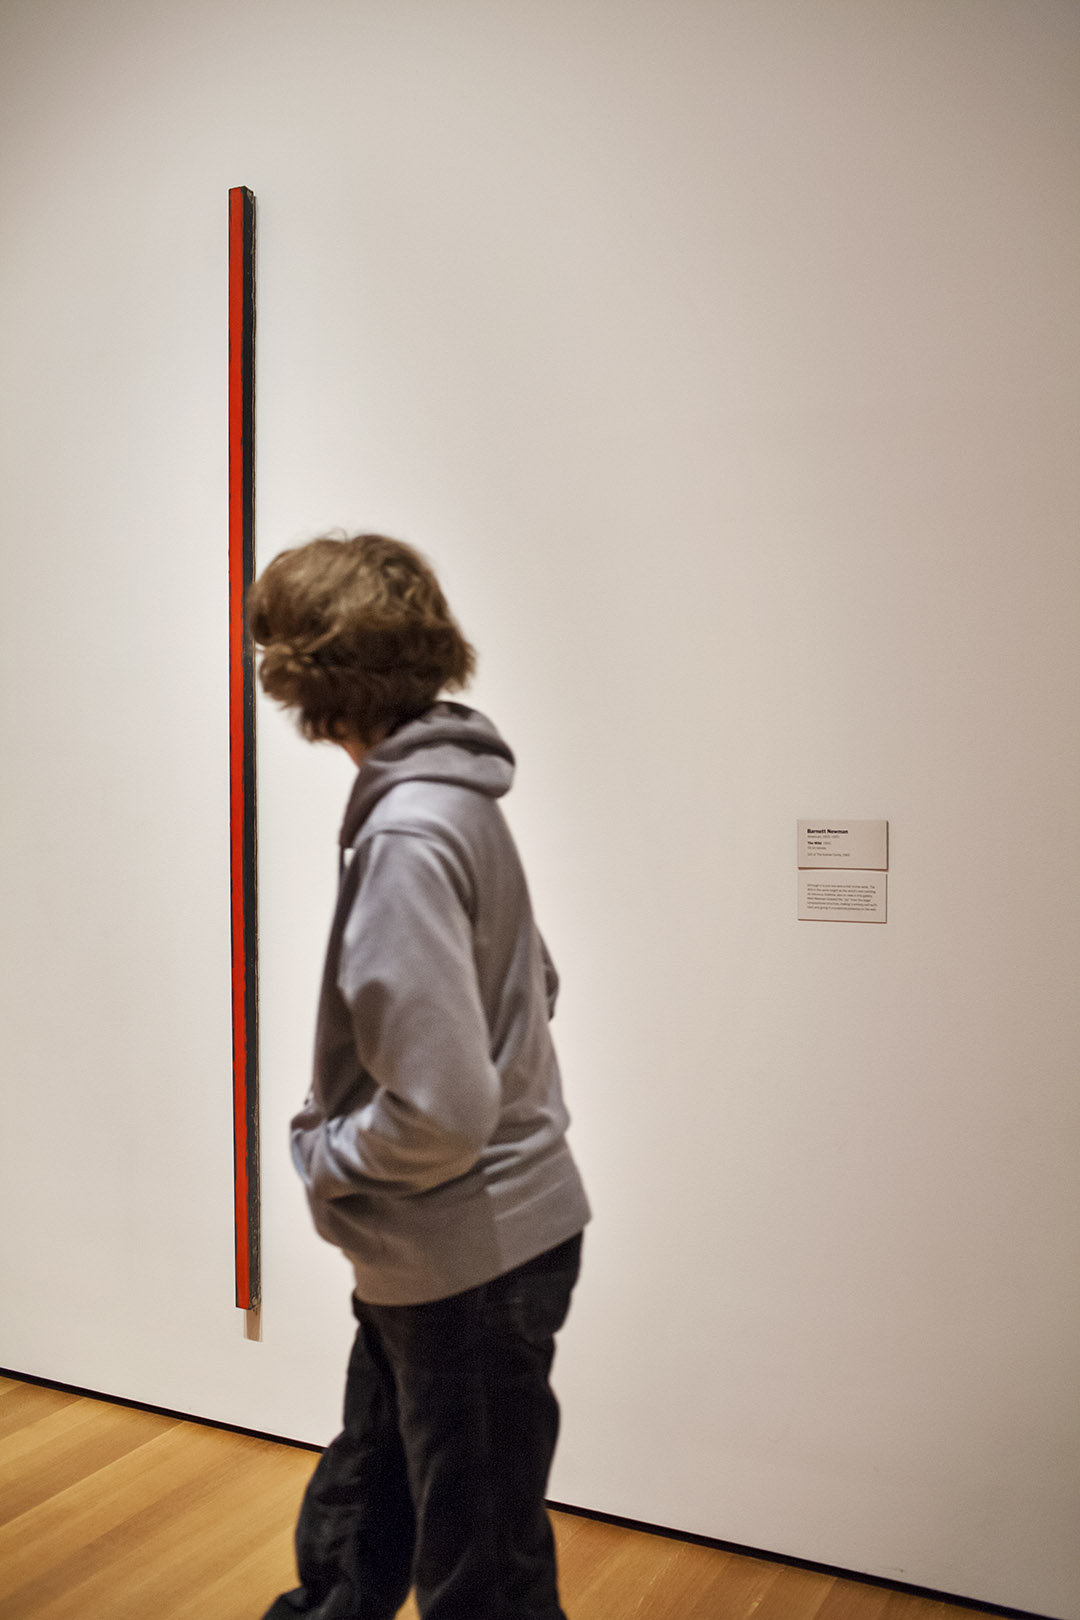 _nf - NewYork, MoMA - Barnett Newman - The wild